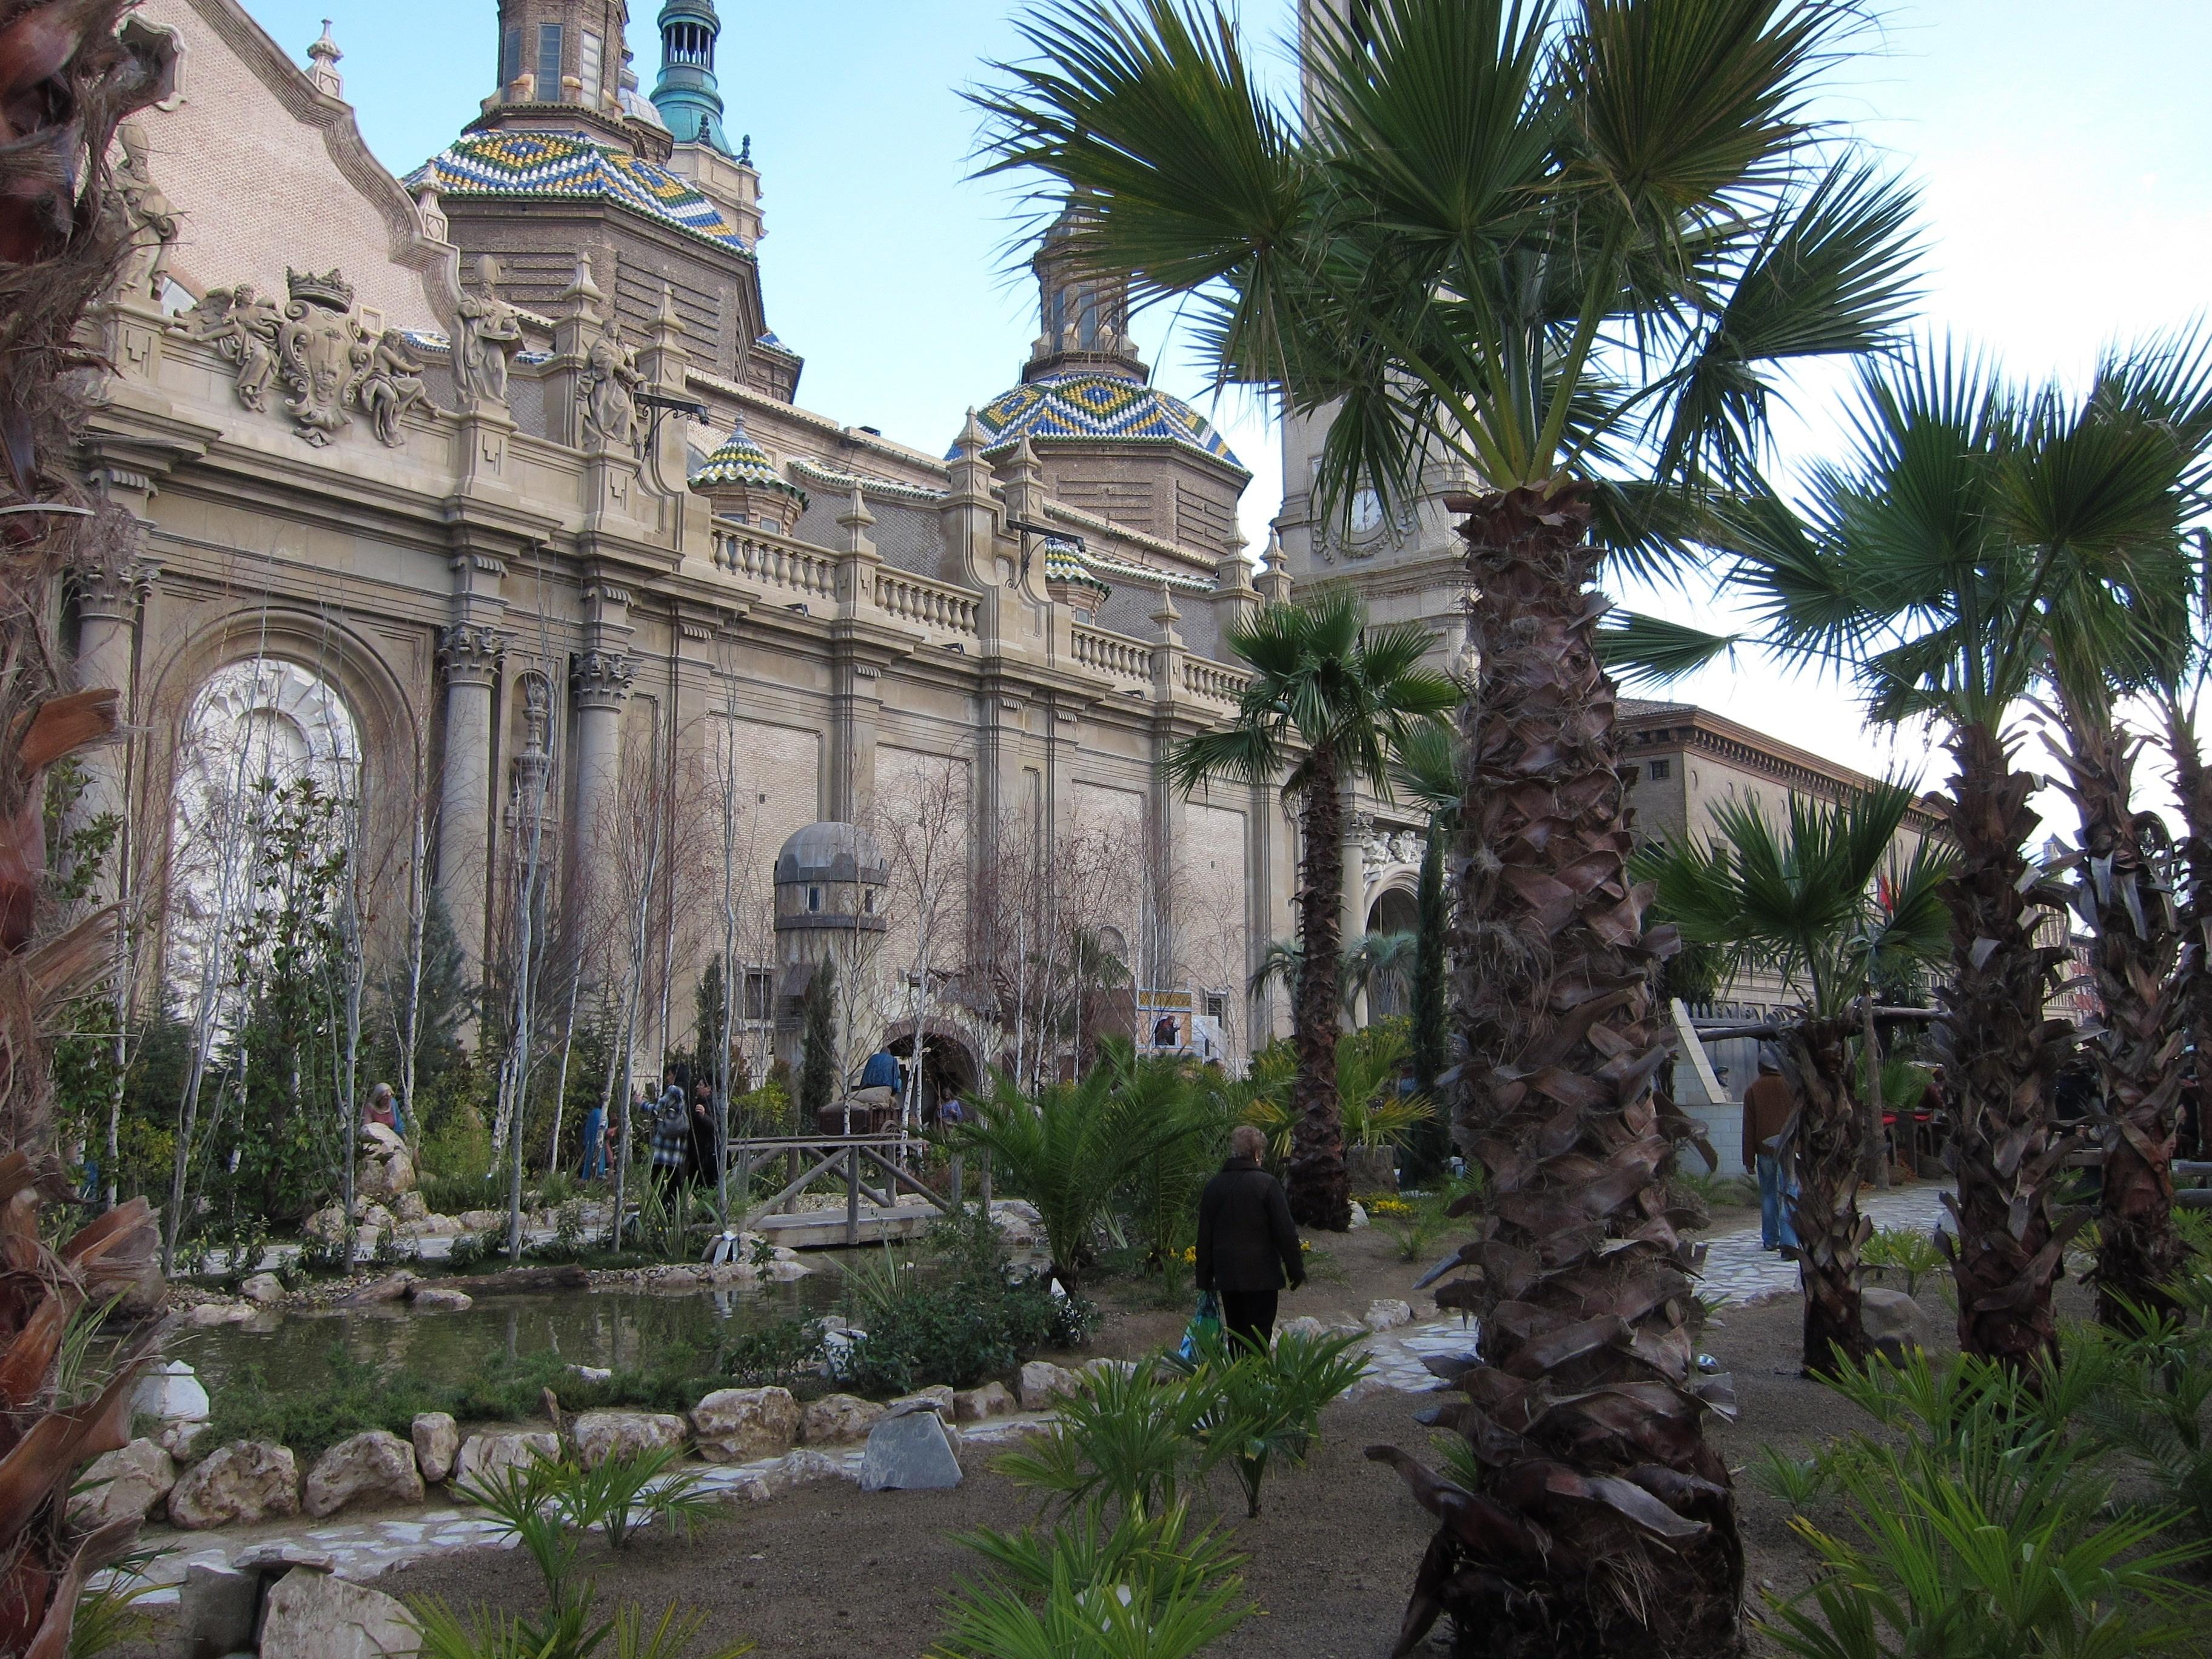 Desaparece el Rey Melchor del Belén de la Plaza del Pilar de Zaragoza